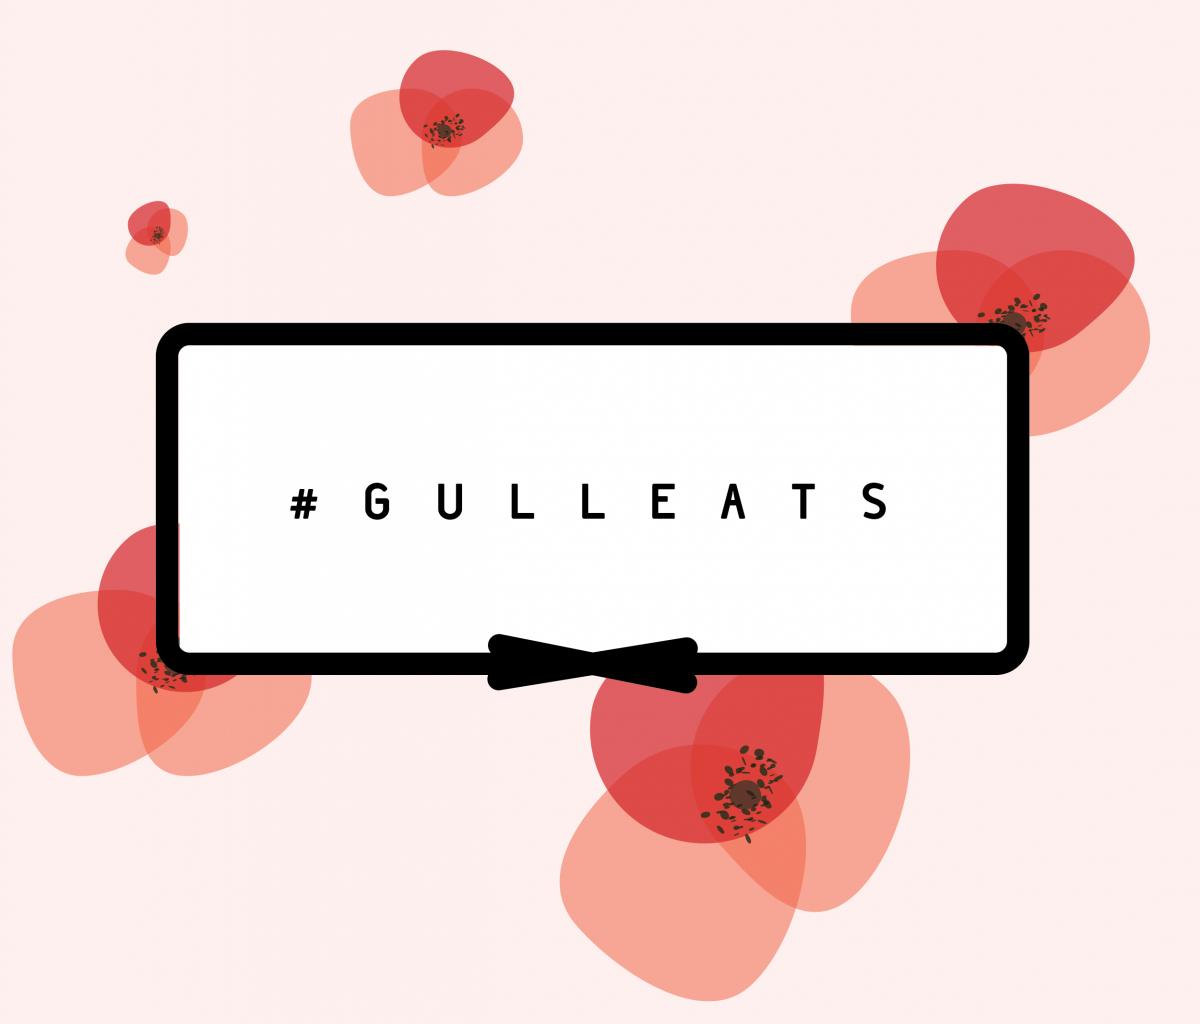 pereg_gulleats-01